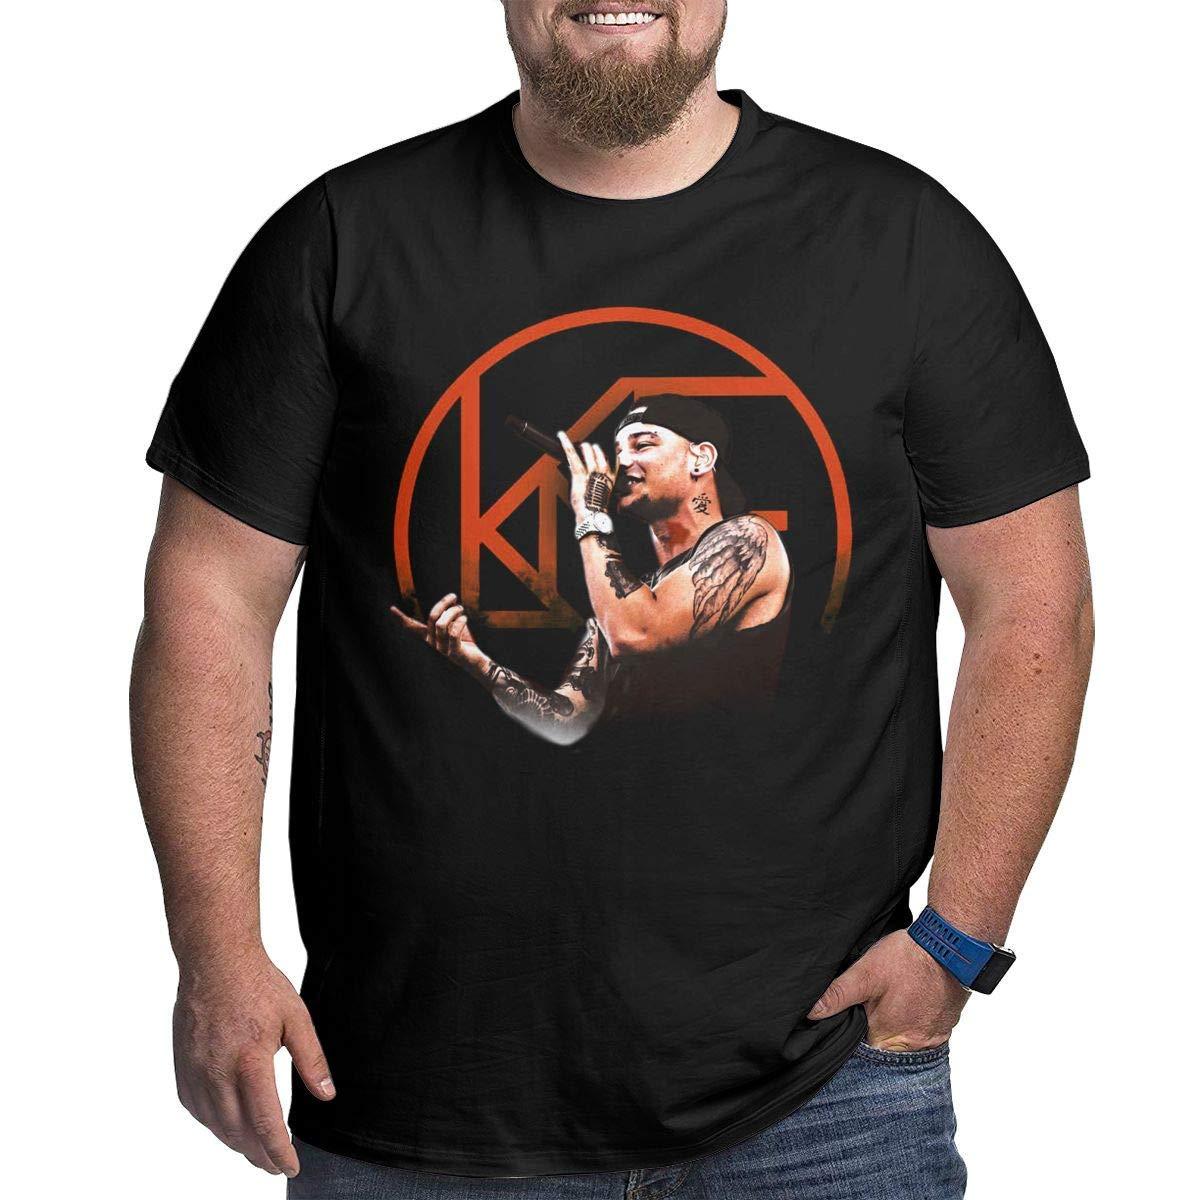 Men Big Size T Shirt Kane Brown Top Cool Oversize Tee Shirt Larger Waist Size